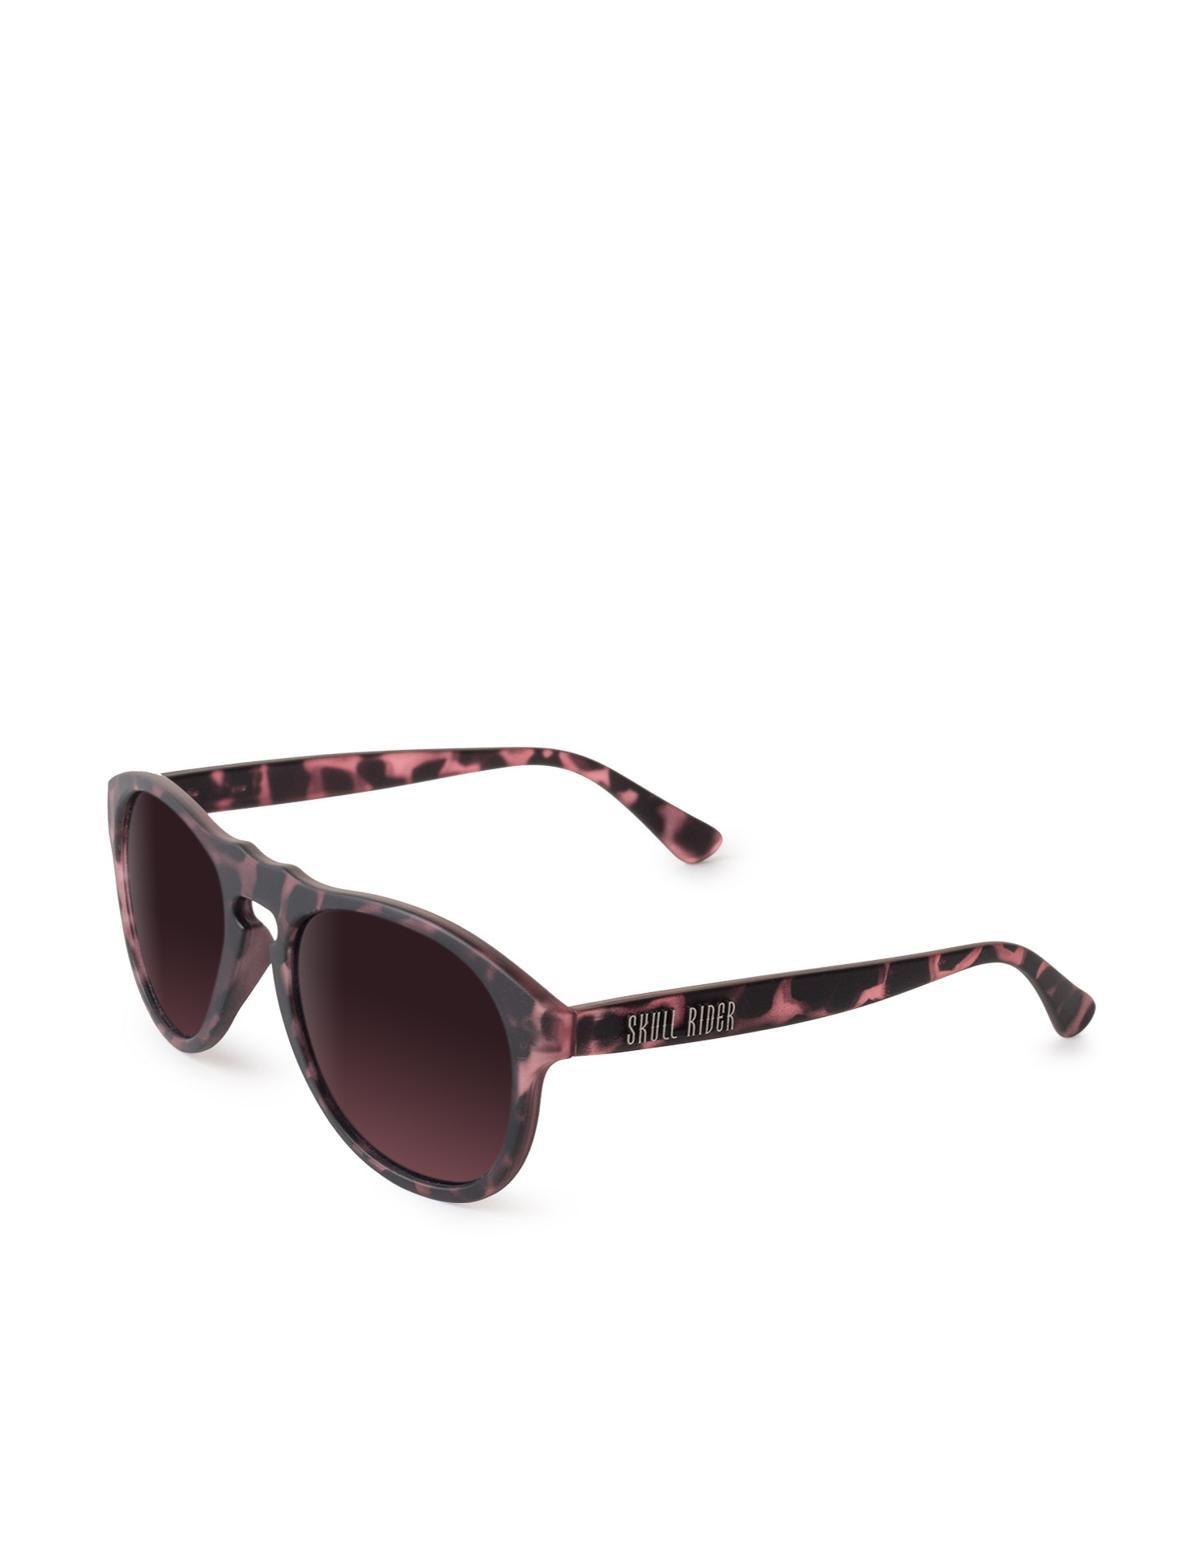 Gafas de sol - Ítem1